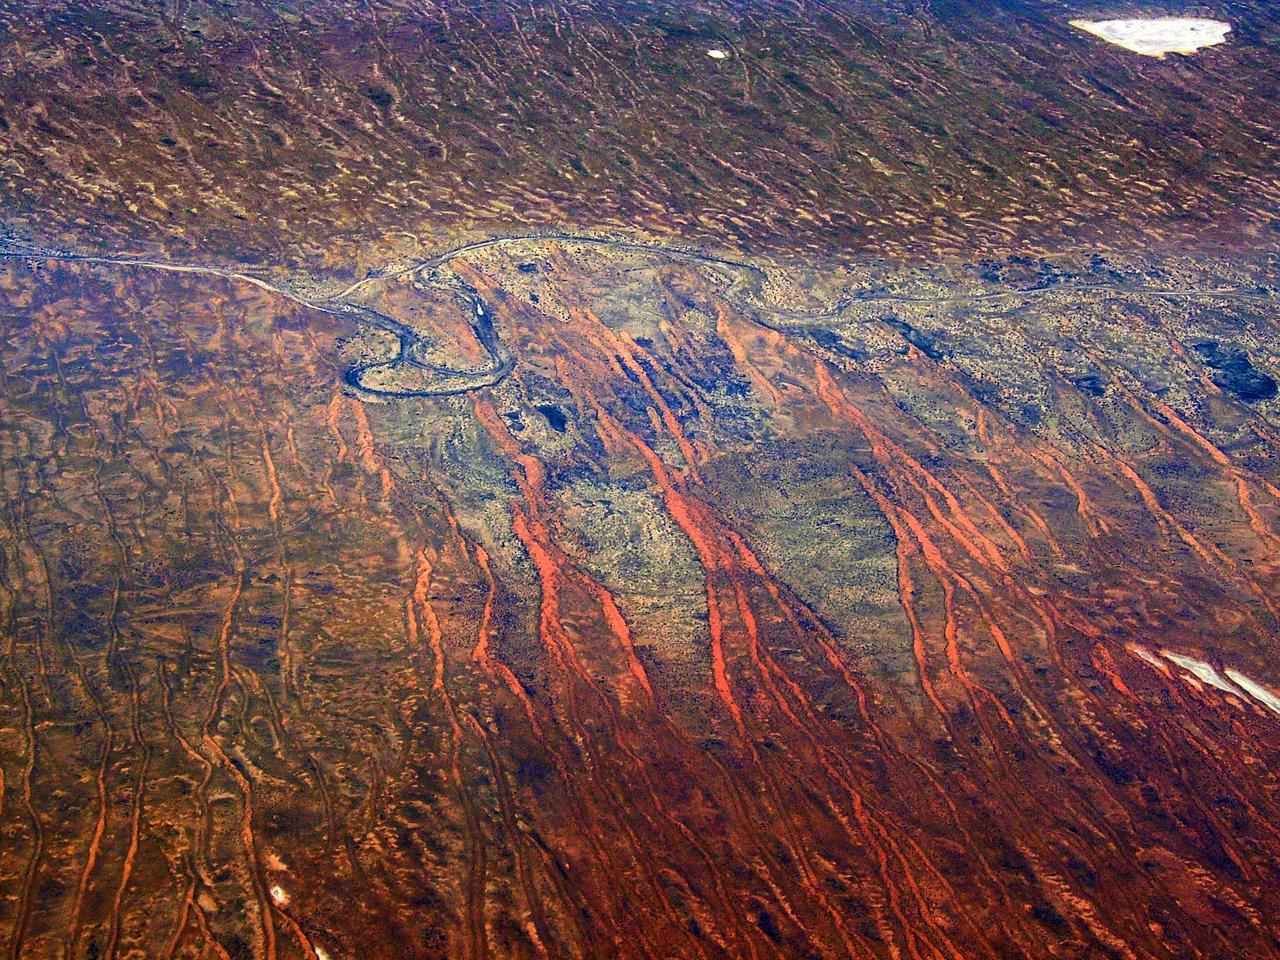 photo image The origins of Pama-Nyungan, Australia's largest family of Aboriginal languages